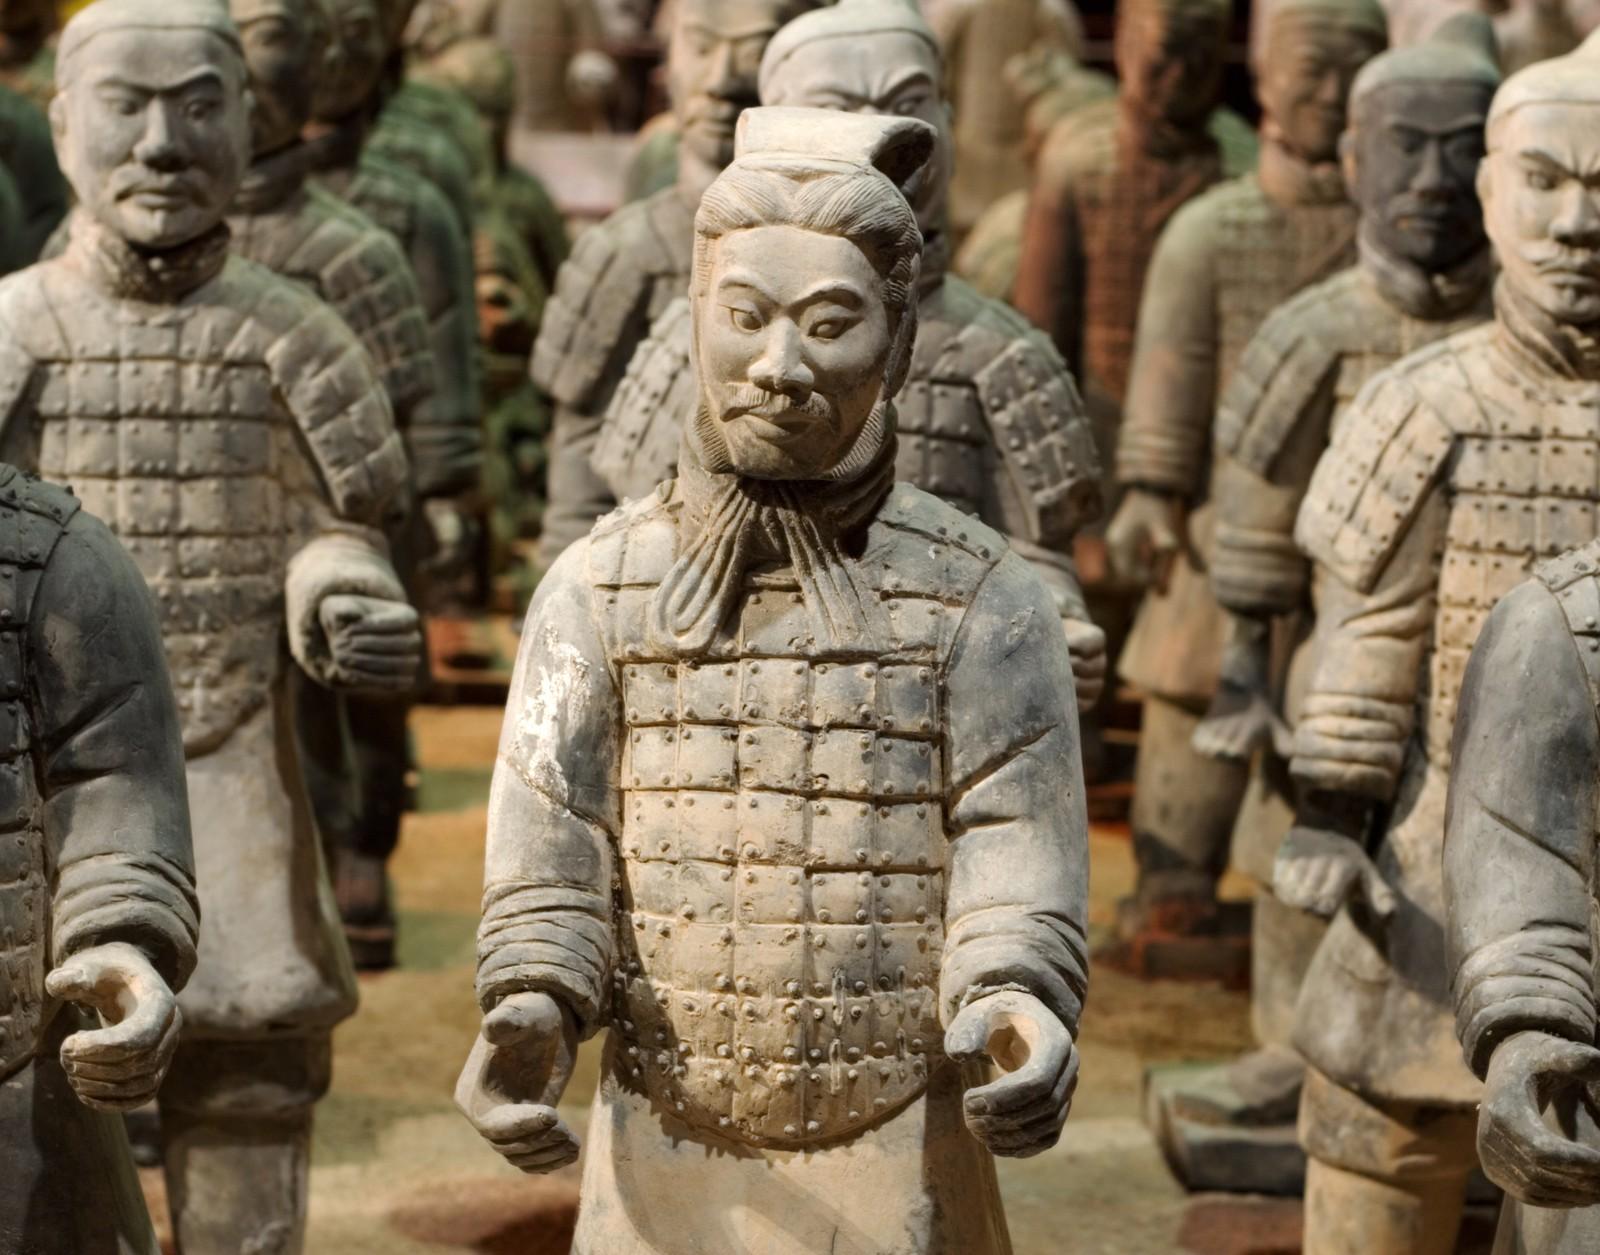 Xian's Terracotta warriors